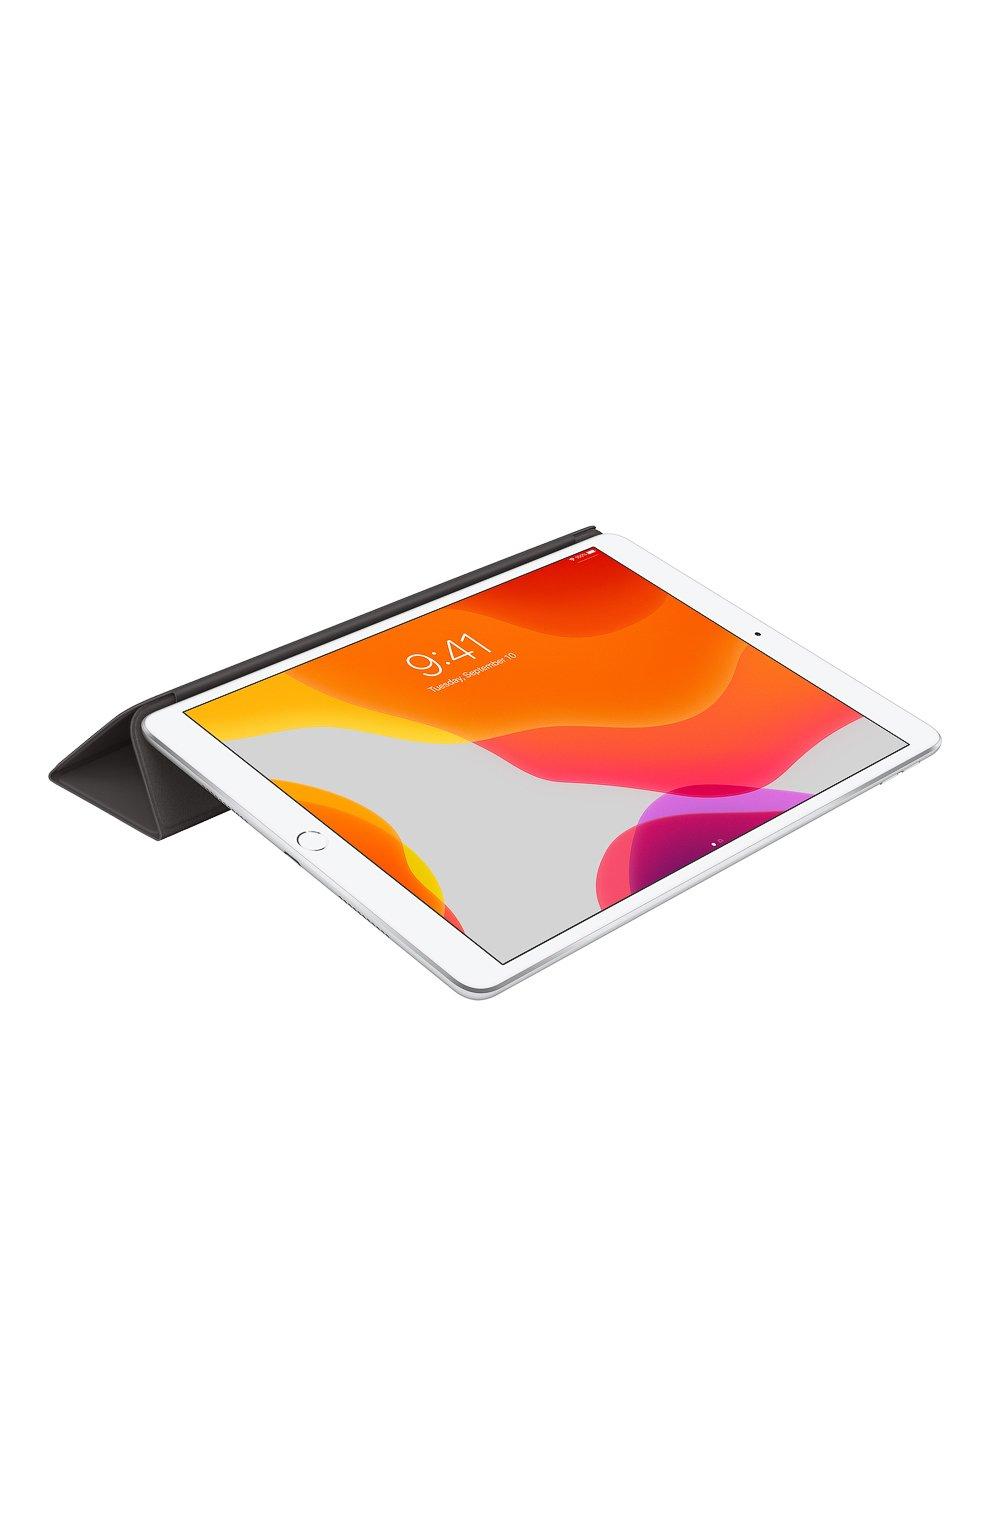 Чехол smart cover для ipad (7th gen)/ipad air (3rd gen) APPLE  черного цвета, арт. MX4U2ZM/A | Фото 4